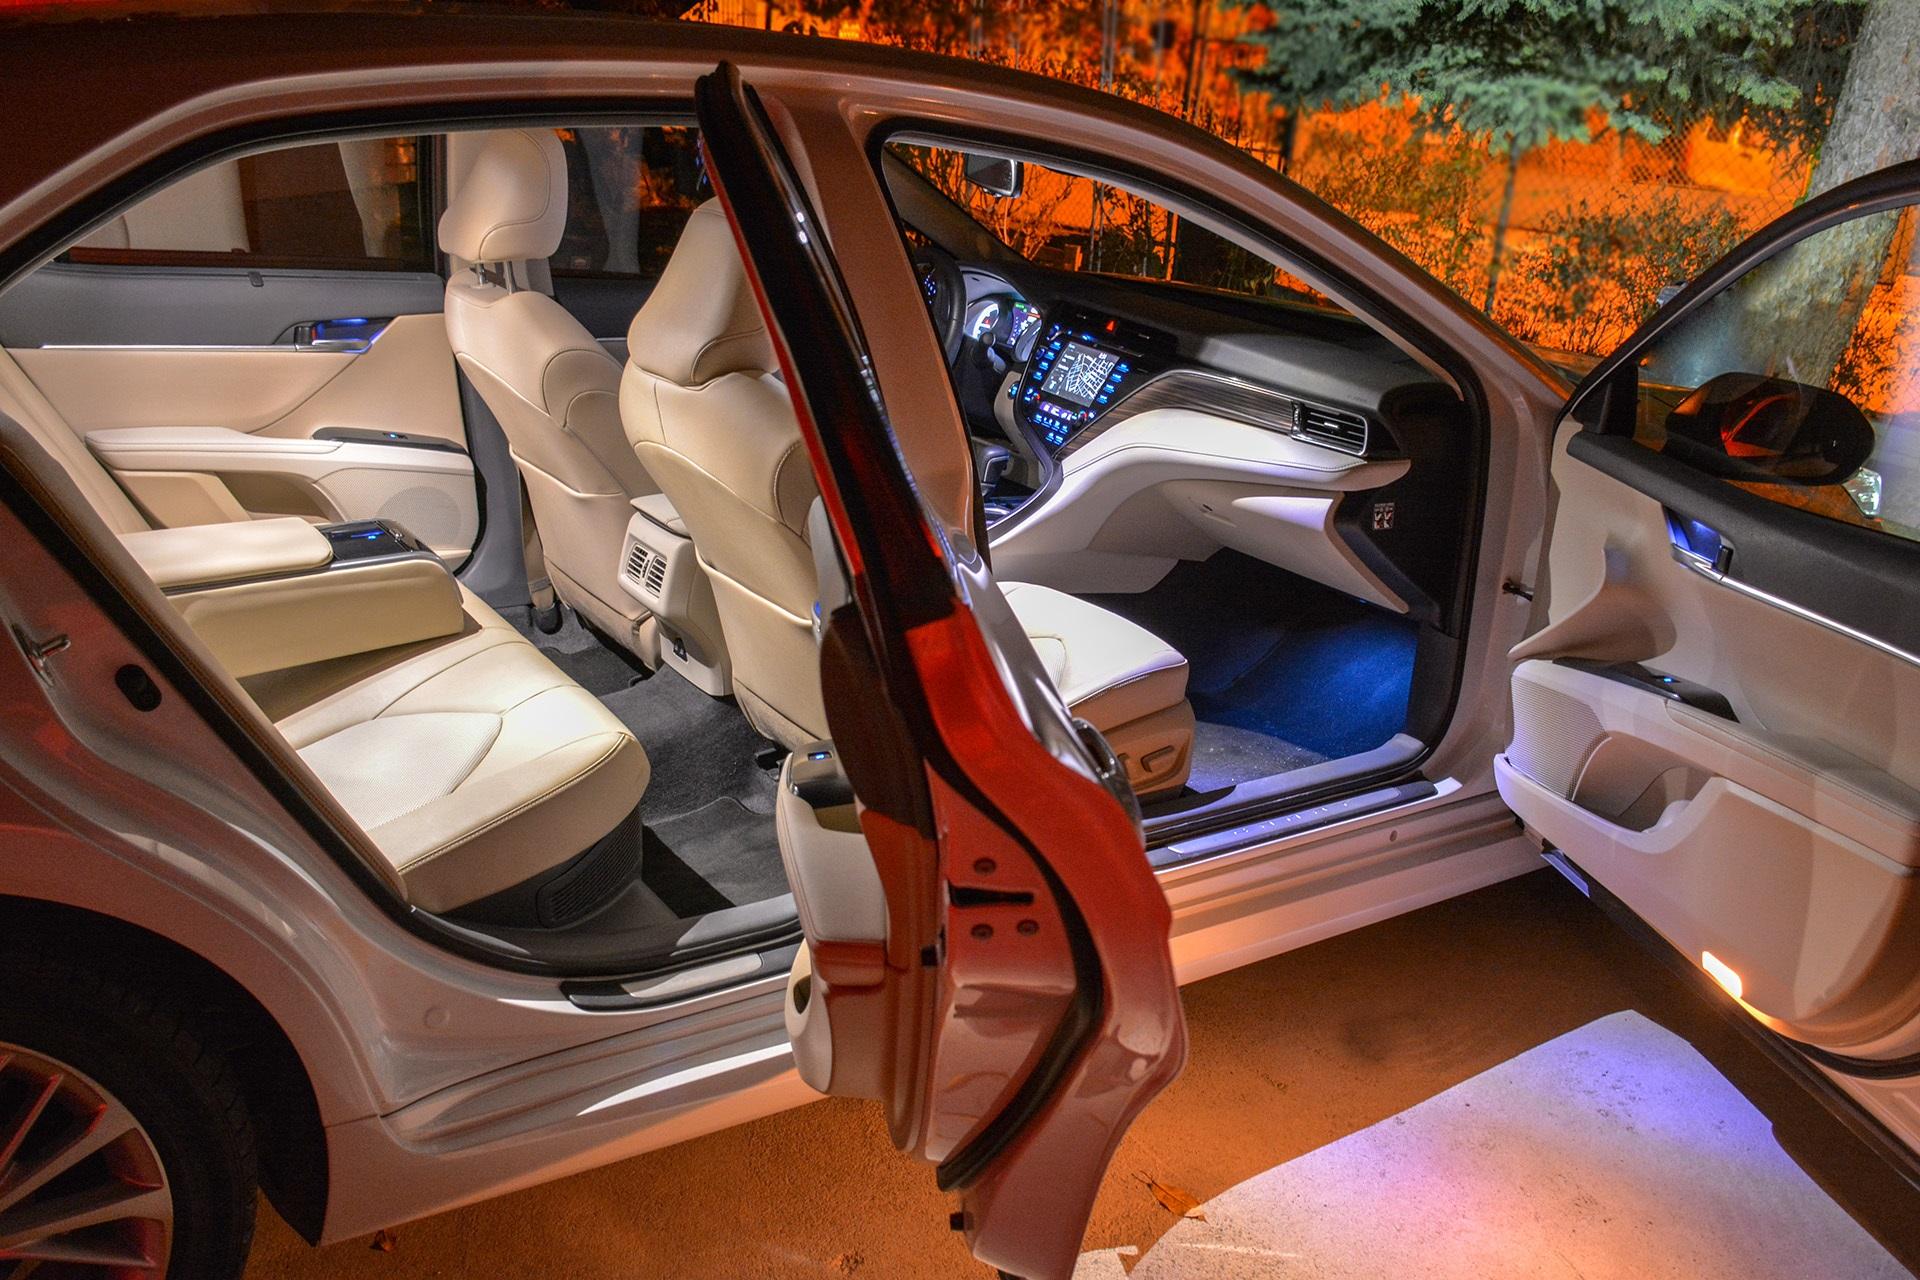 Toyota Camry Executive VIP 2.5 Hybrid